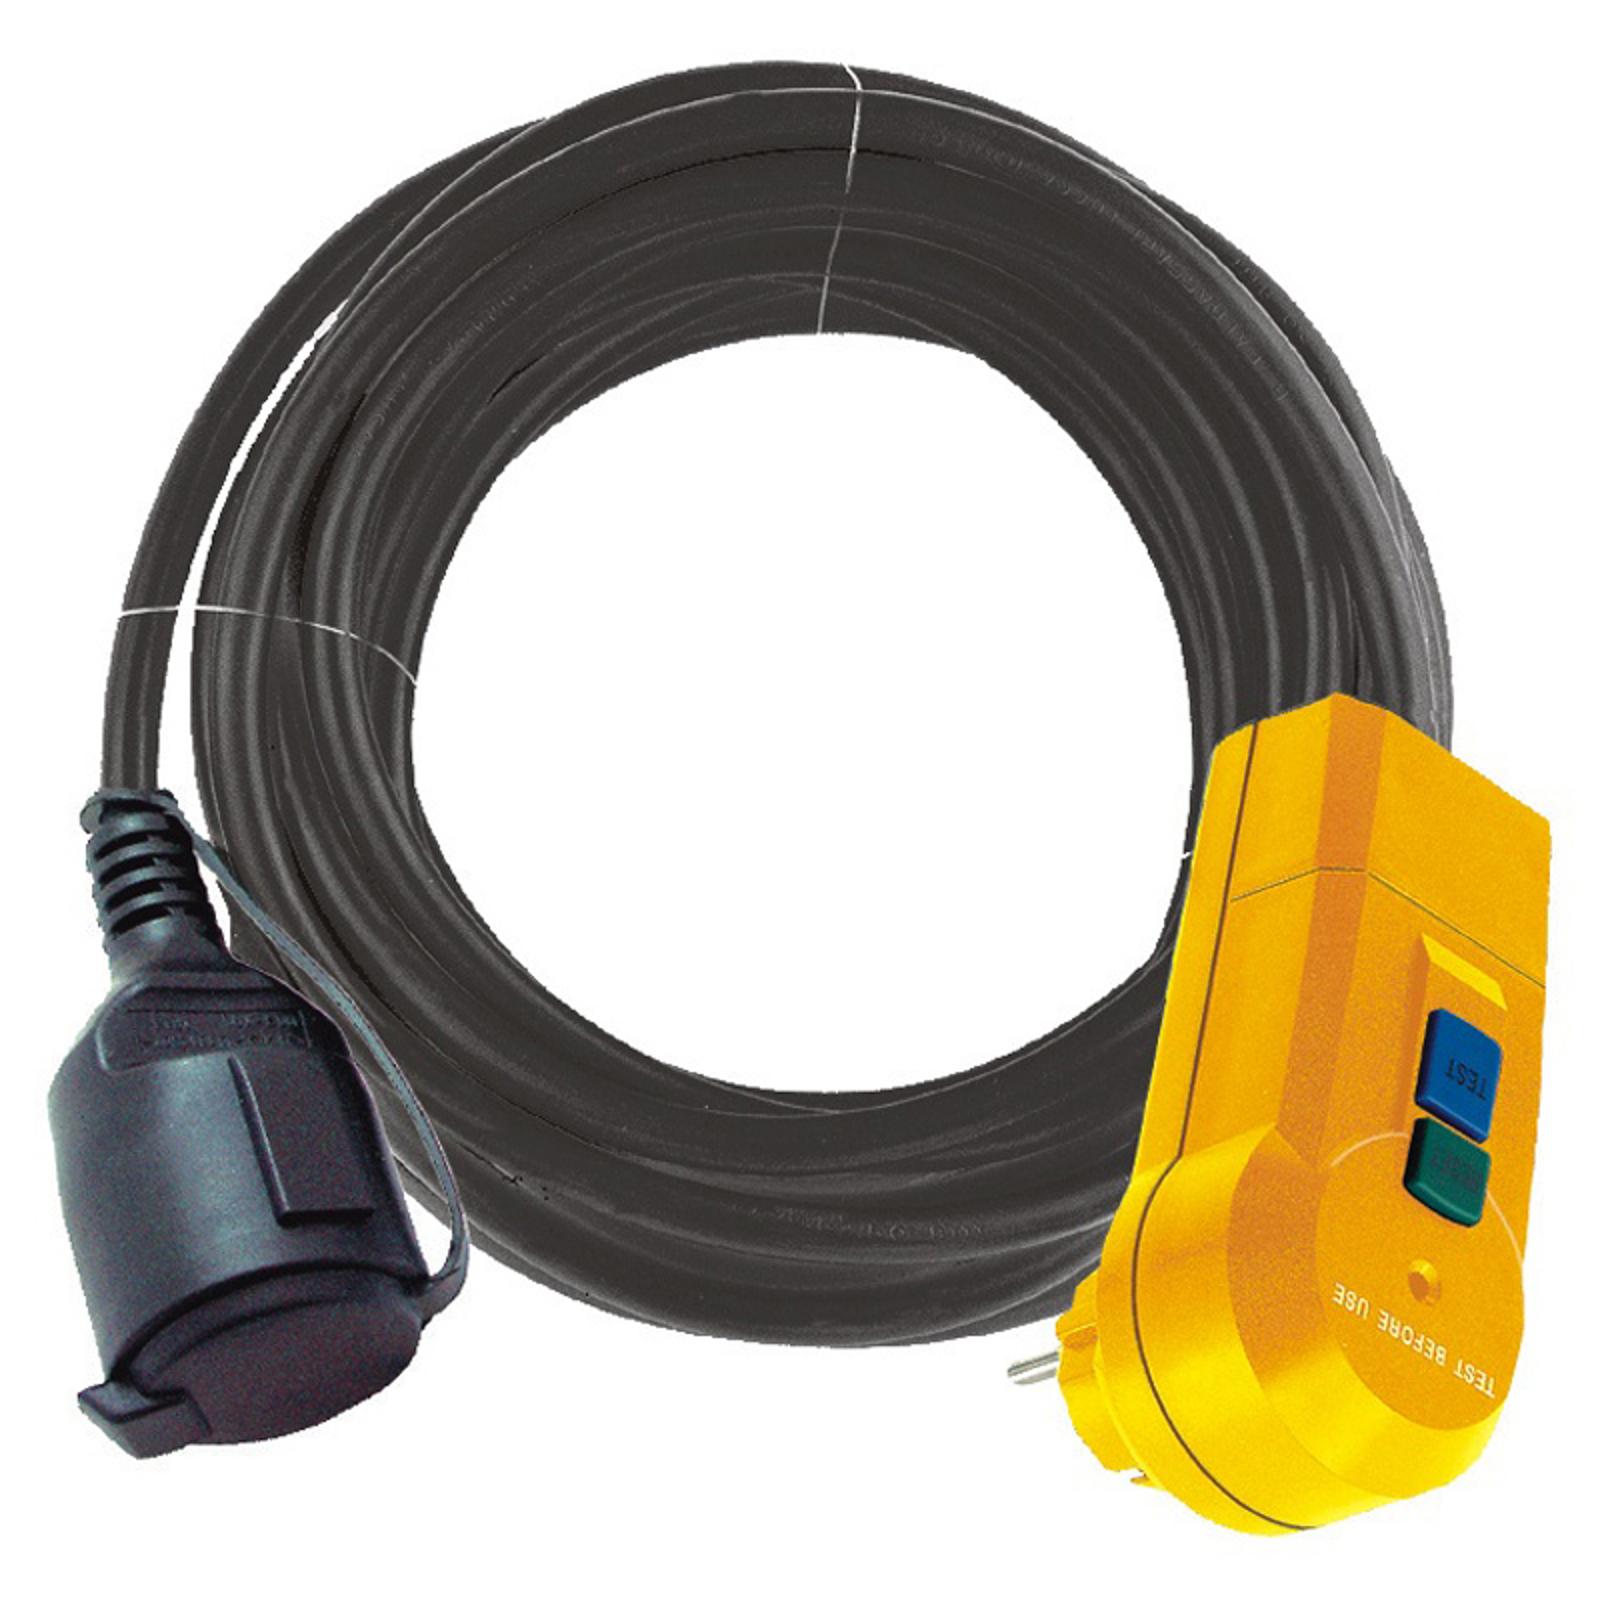 FI IP44 personbeskyt.adapterledning til udebrug